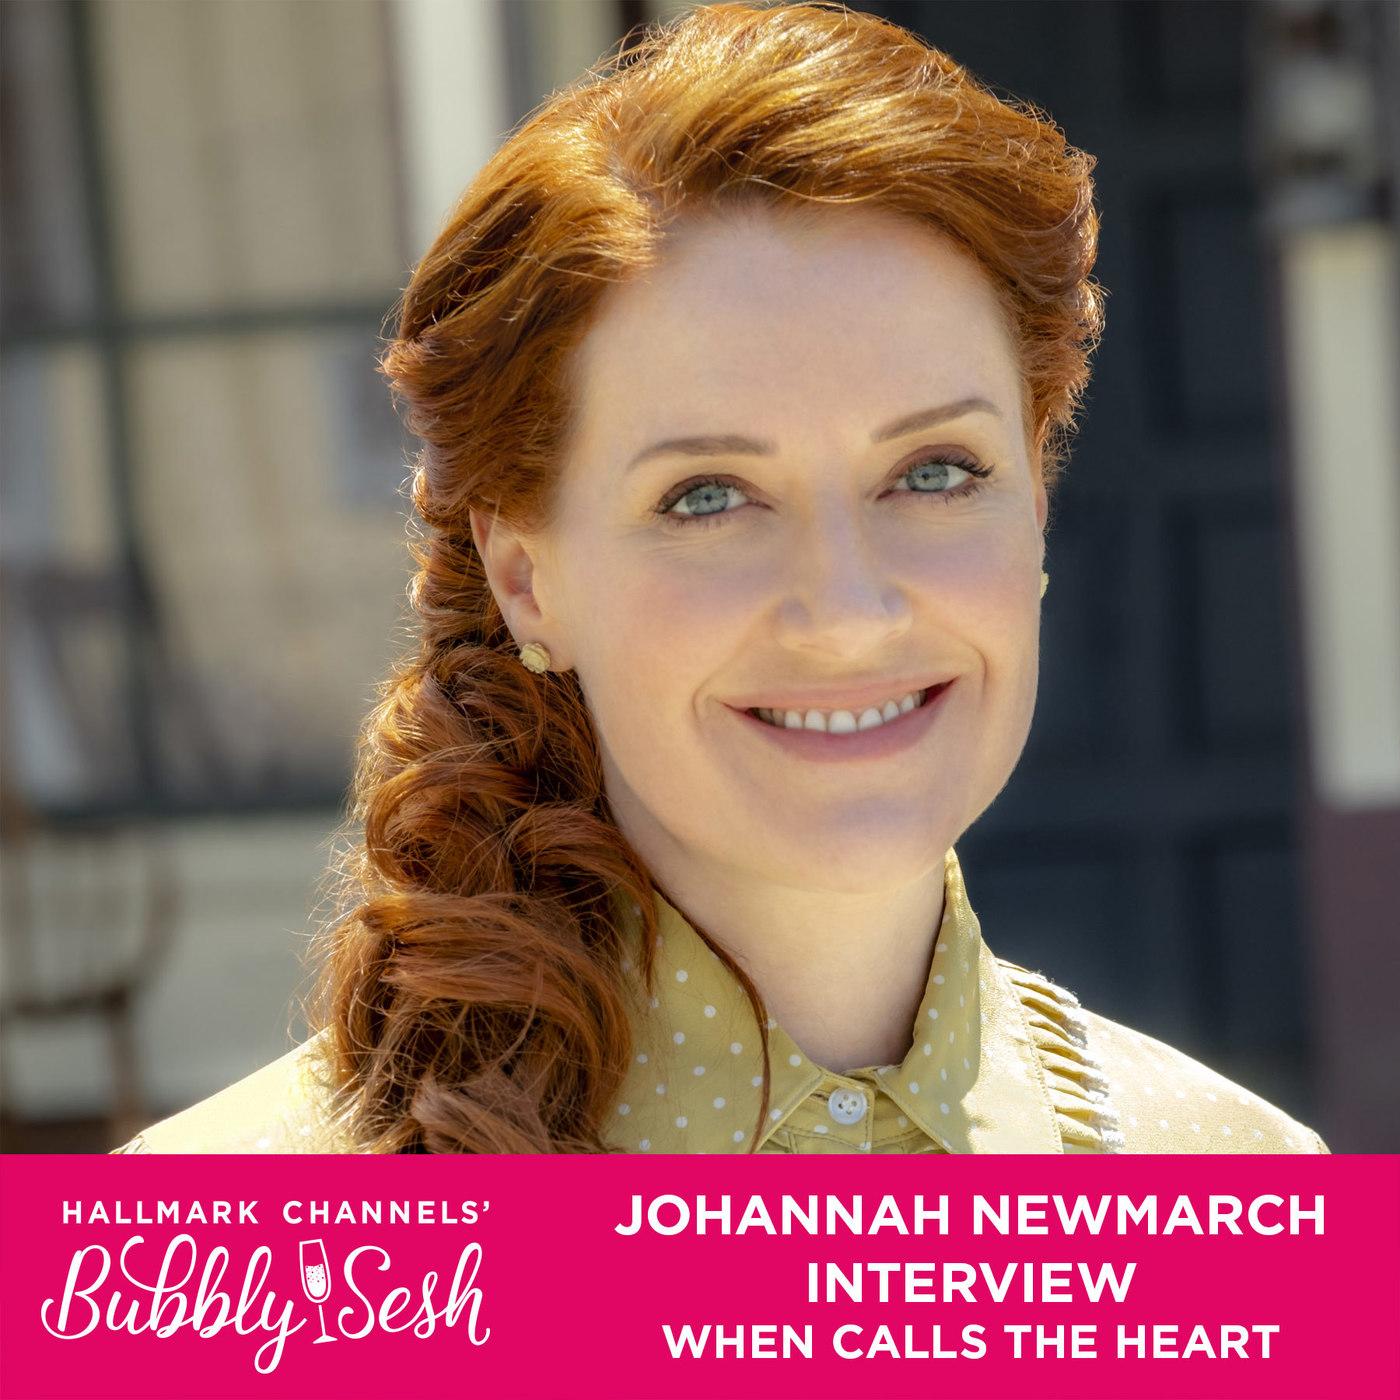 Johannah Newmarch Interview, When Calls The Heart